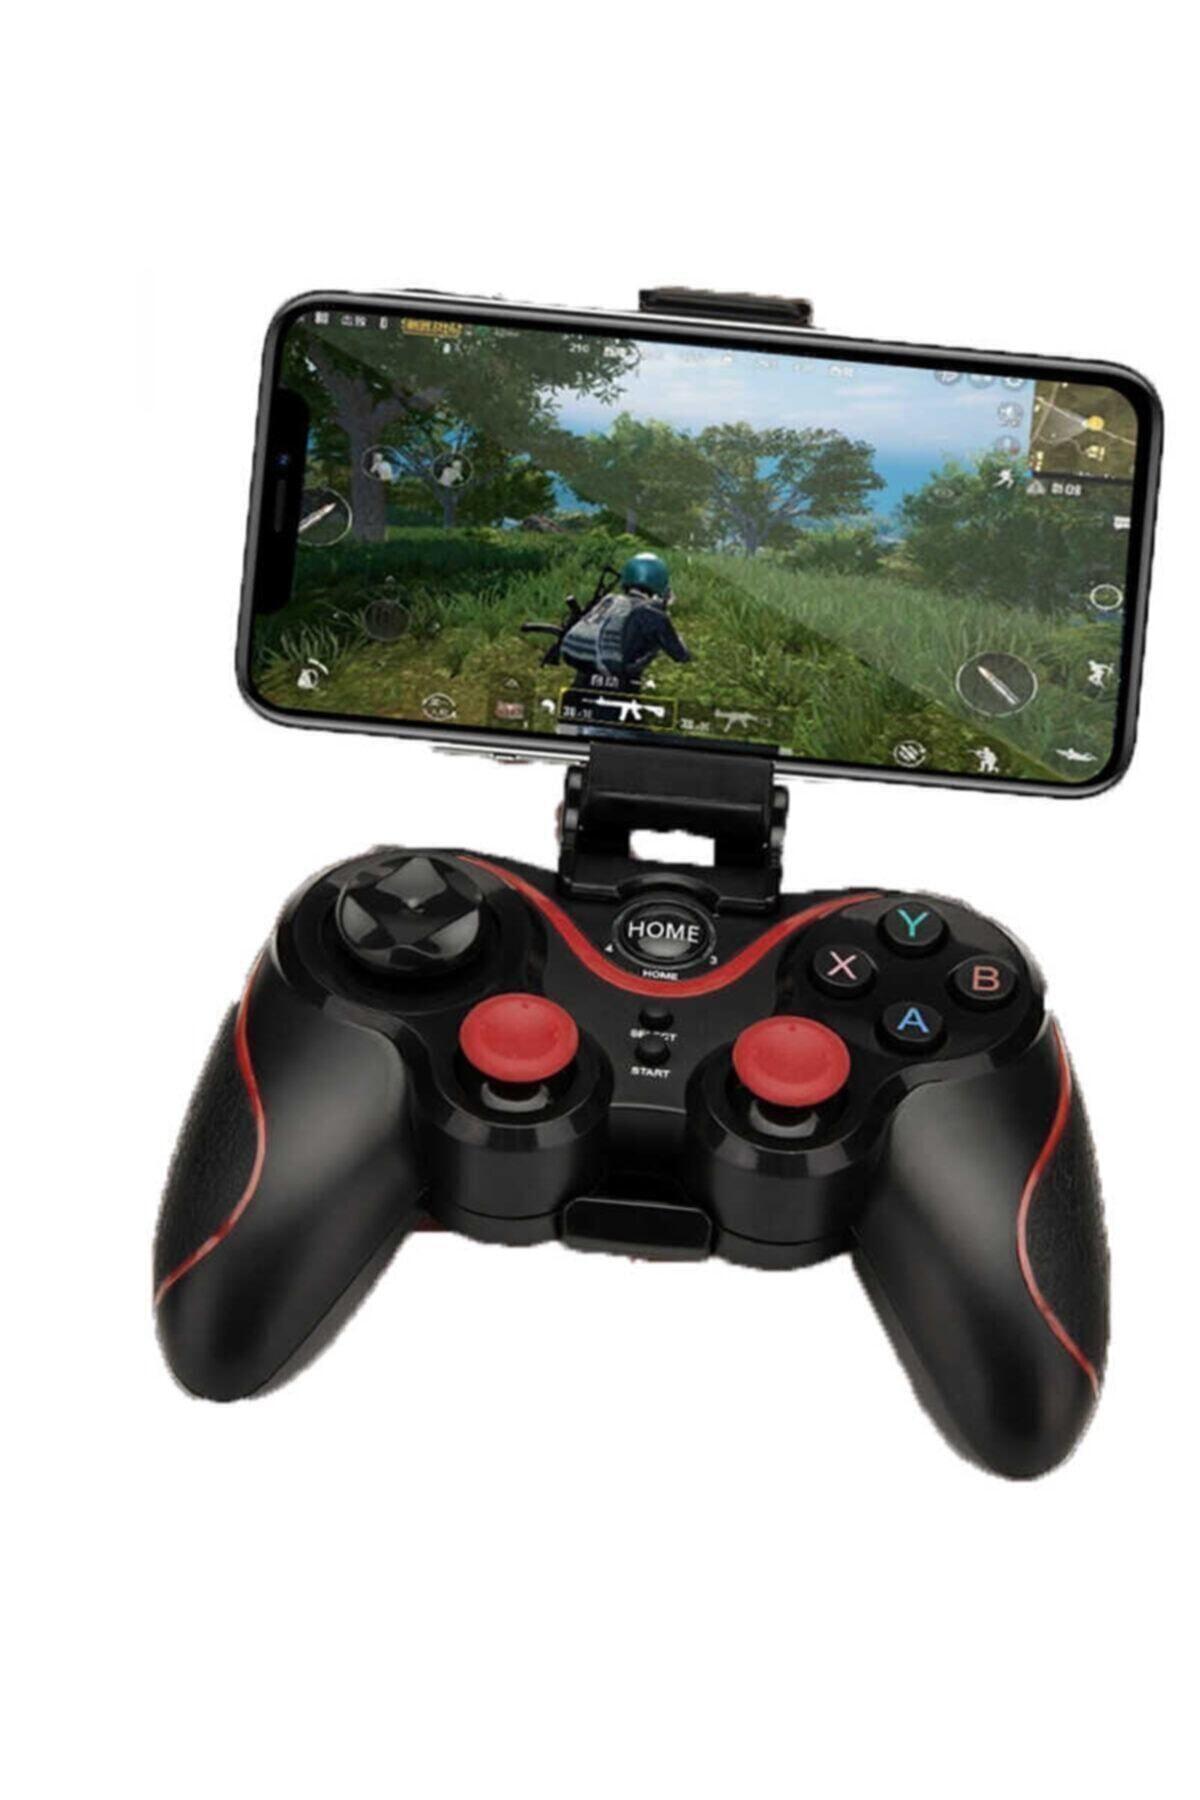 BLUPPLE S6 Pubg Gamer Bluetooth Oyun Konsolu Mobil Oyun Kolu Siyah Renk 1